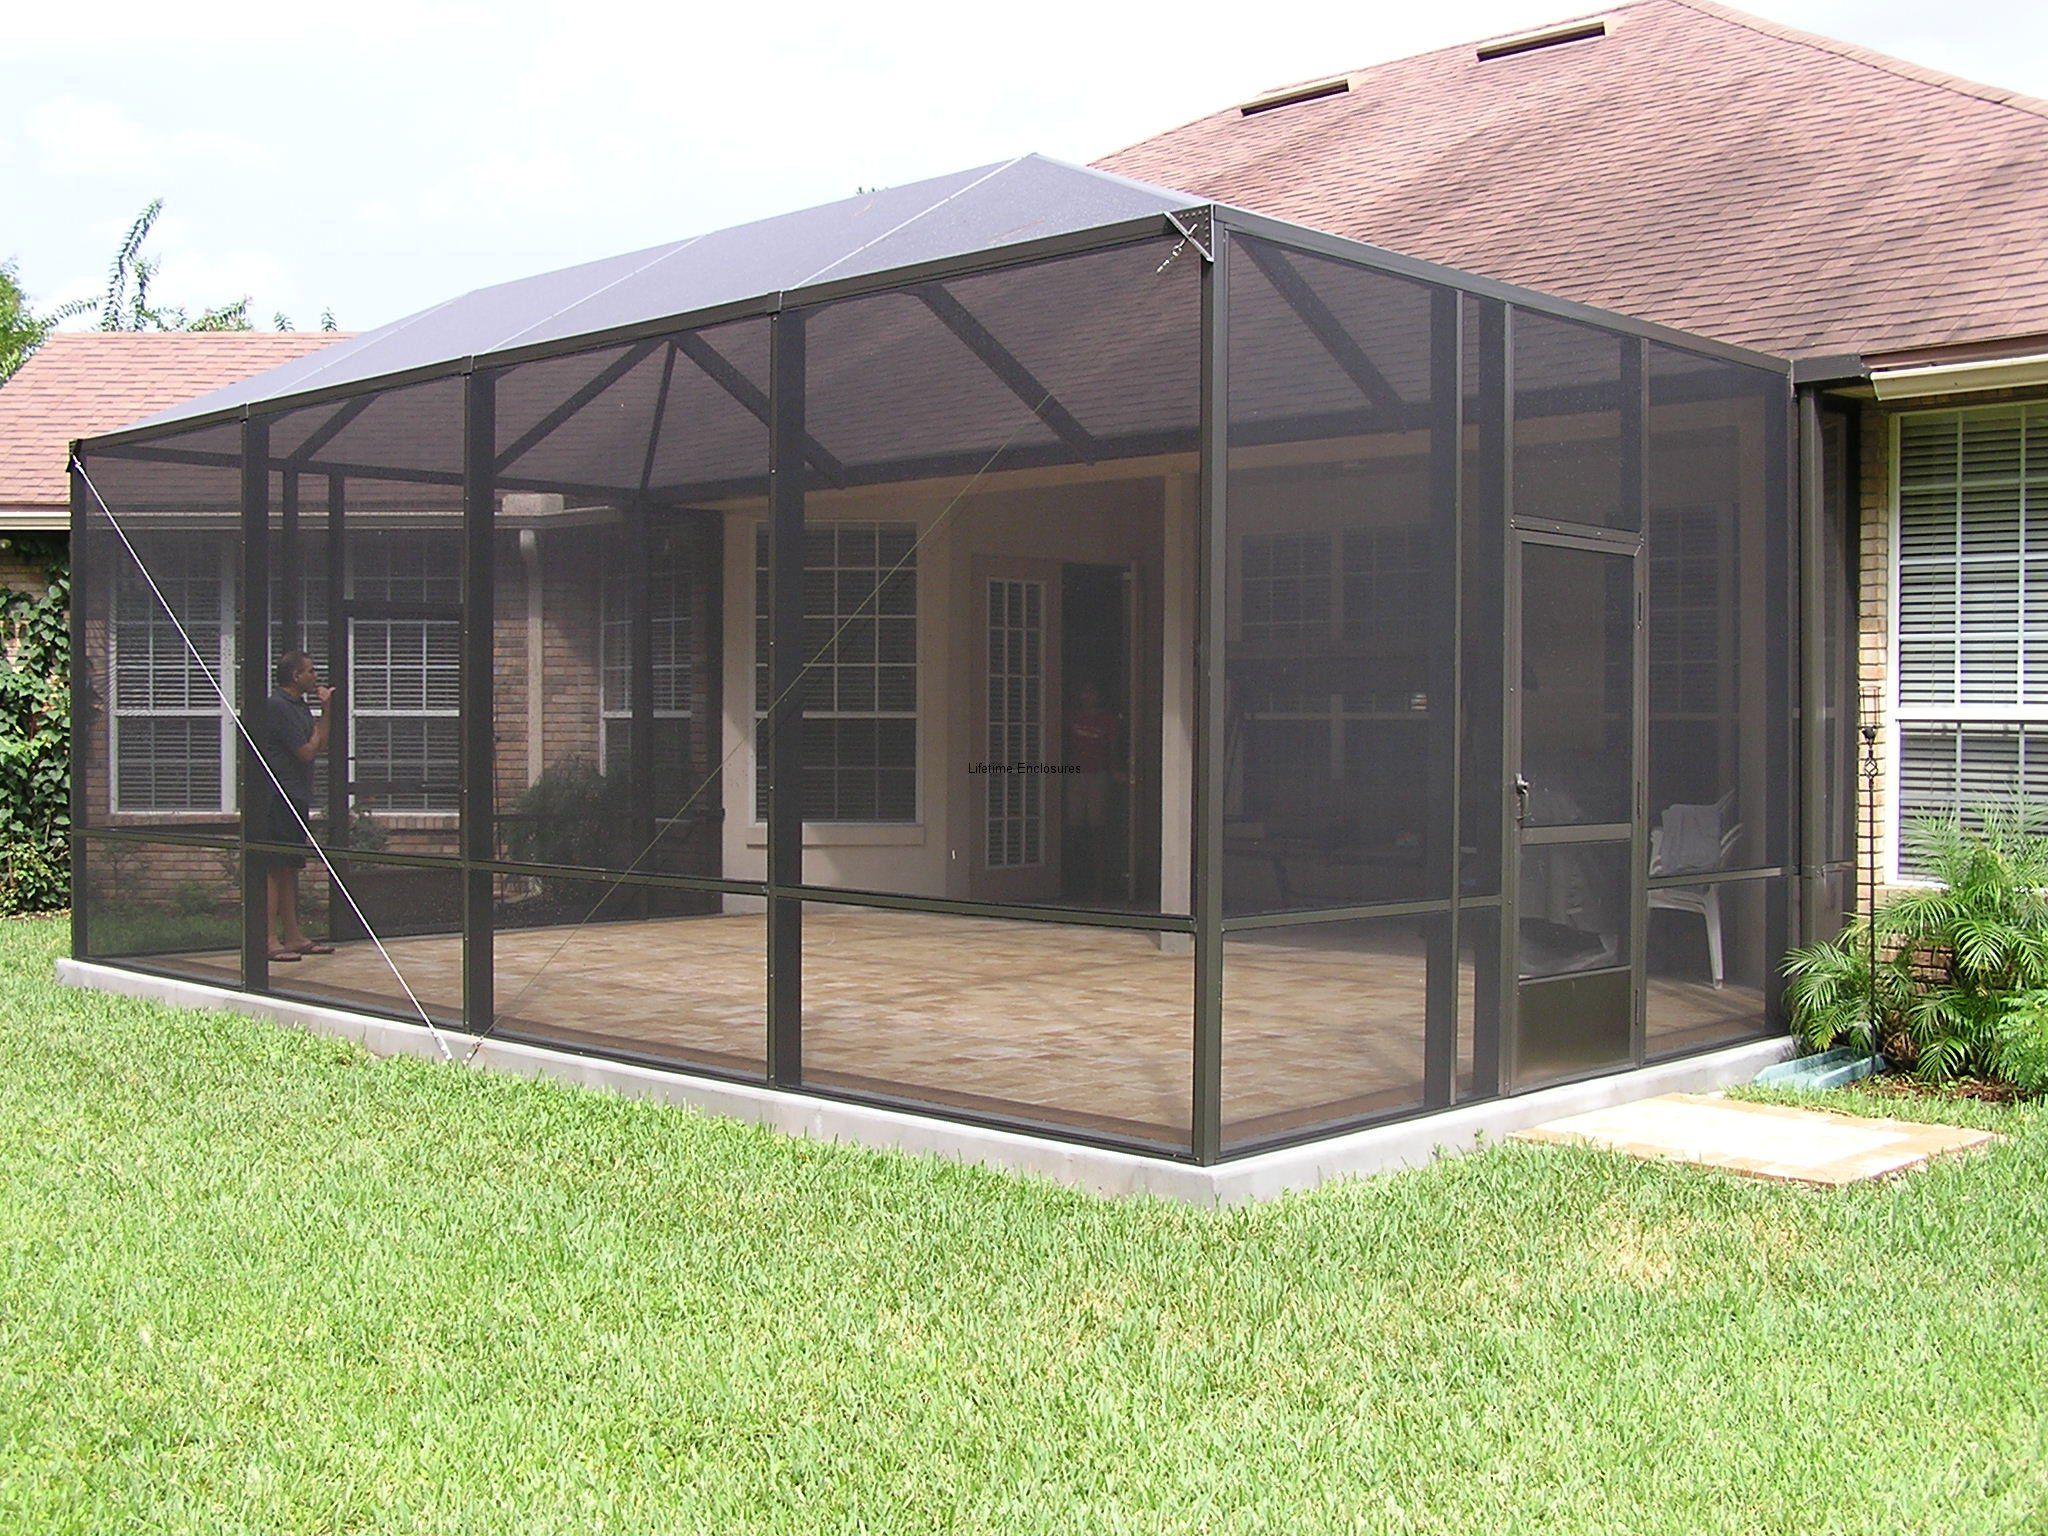 Patio, Lanai U0026 Porch Screen Enclosures | Dulando Screen And Awning | Haus  Renovieren | Pinterest | Screen Enclosures, Lanai And Patios